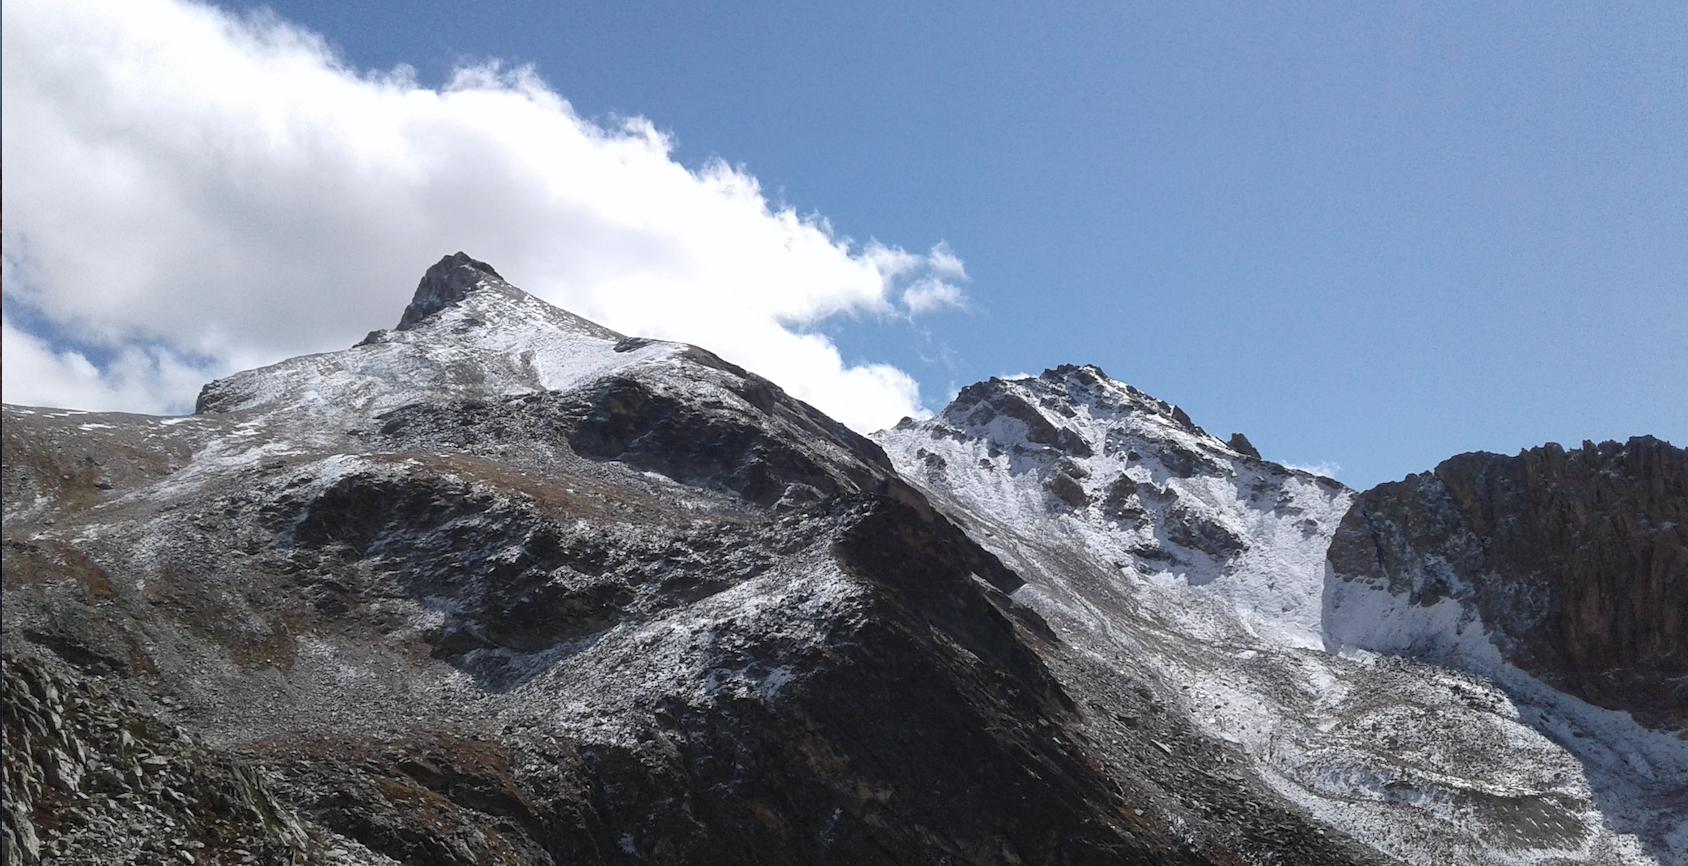 La Guida - Tre escursioni nelle valli Stura, Maira e Vermenagna